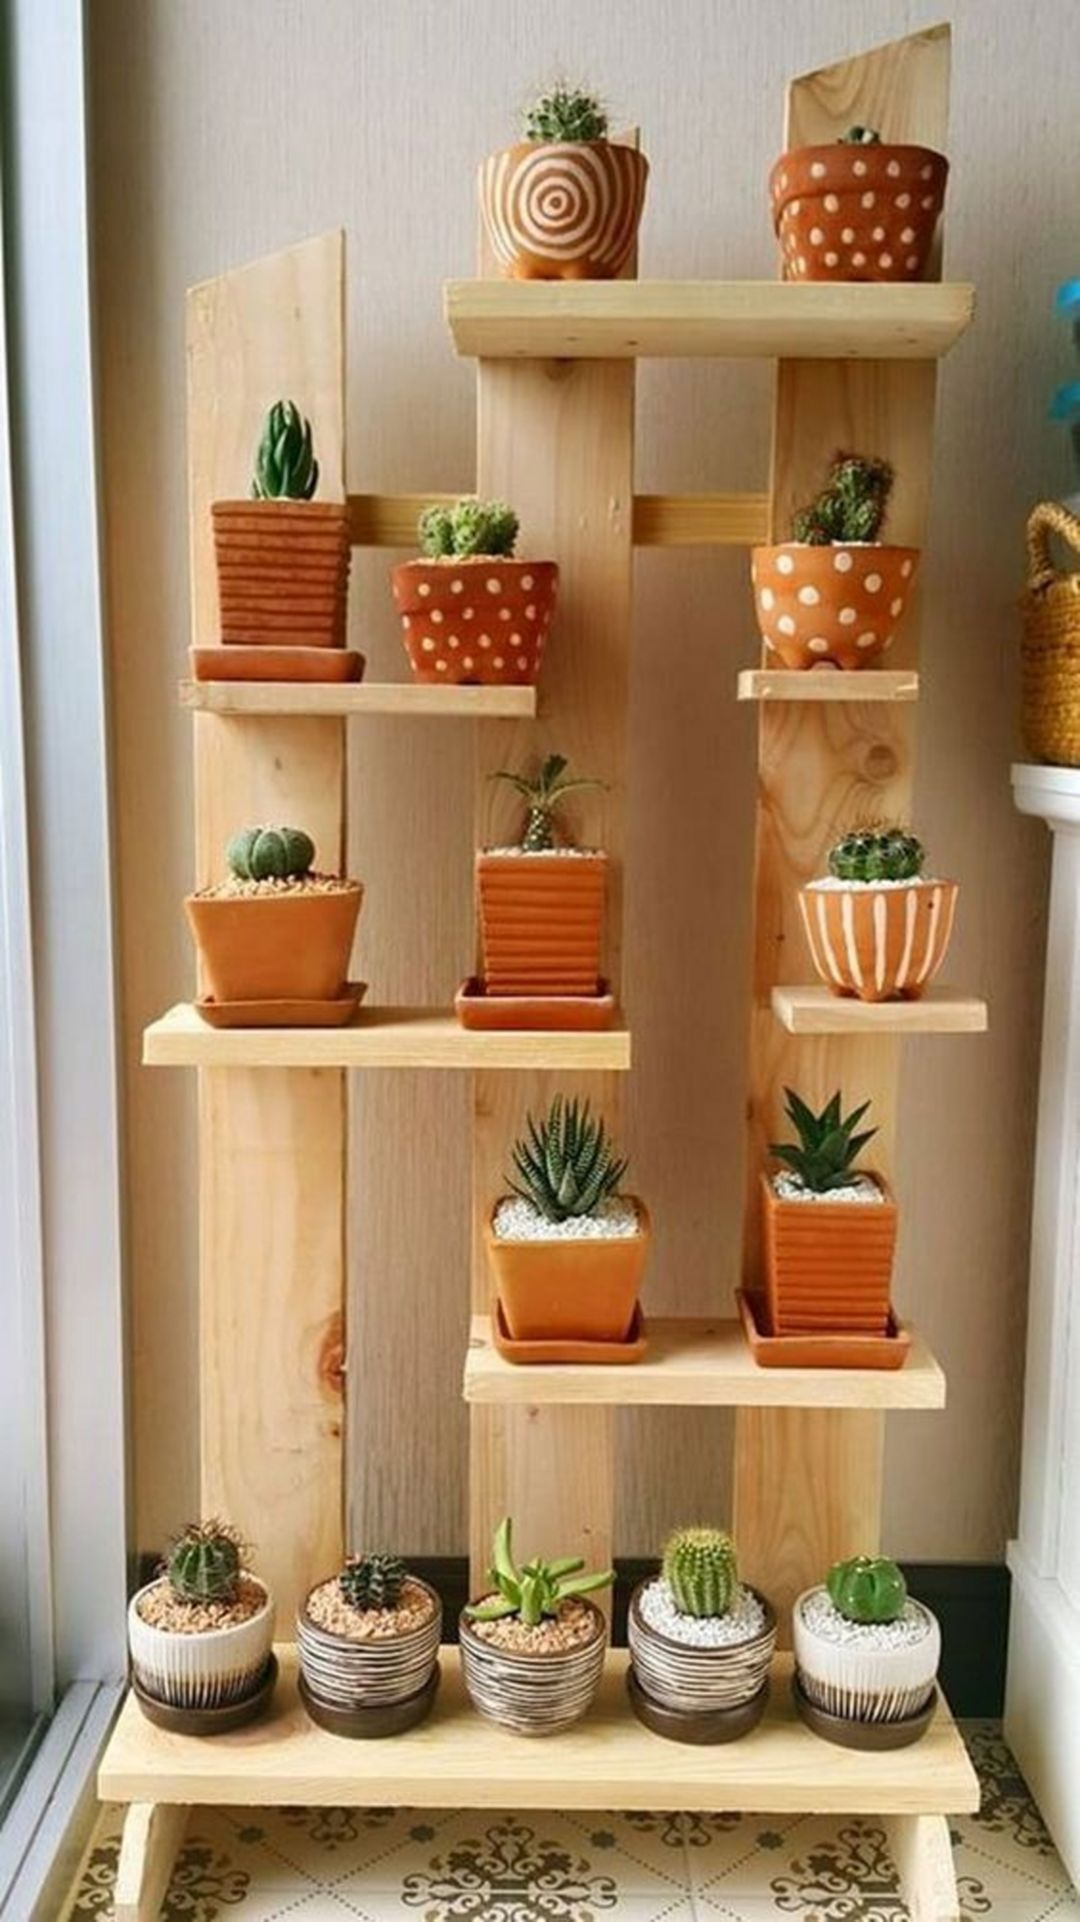 10 Awesome Diy Plant Shelf Design Ideas To Organize Your Indoor Garden Design Decorating Indoor Plant Shelves Diy Plant Stand Plant Shelves